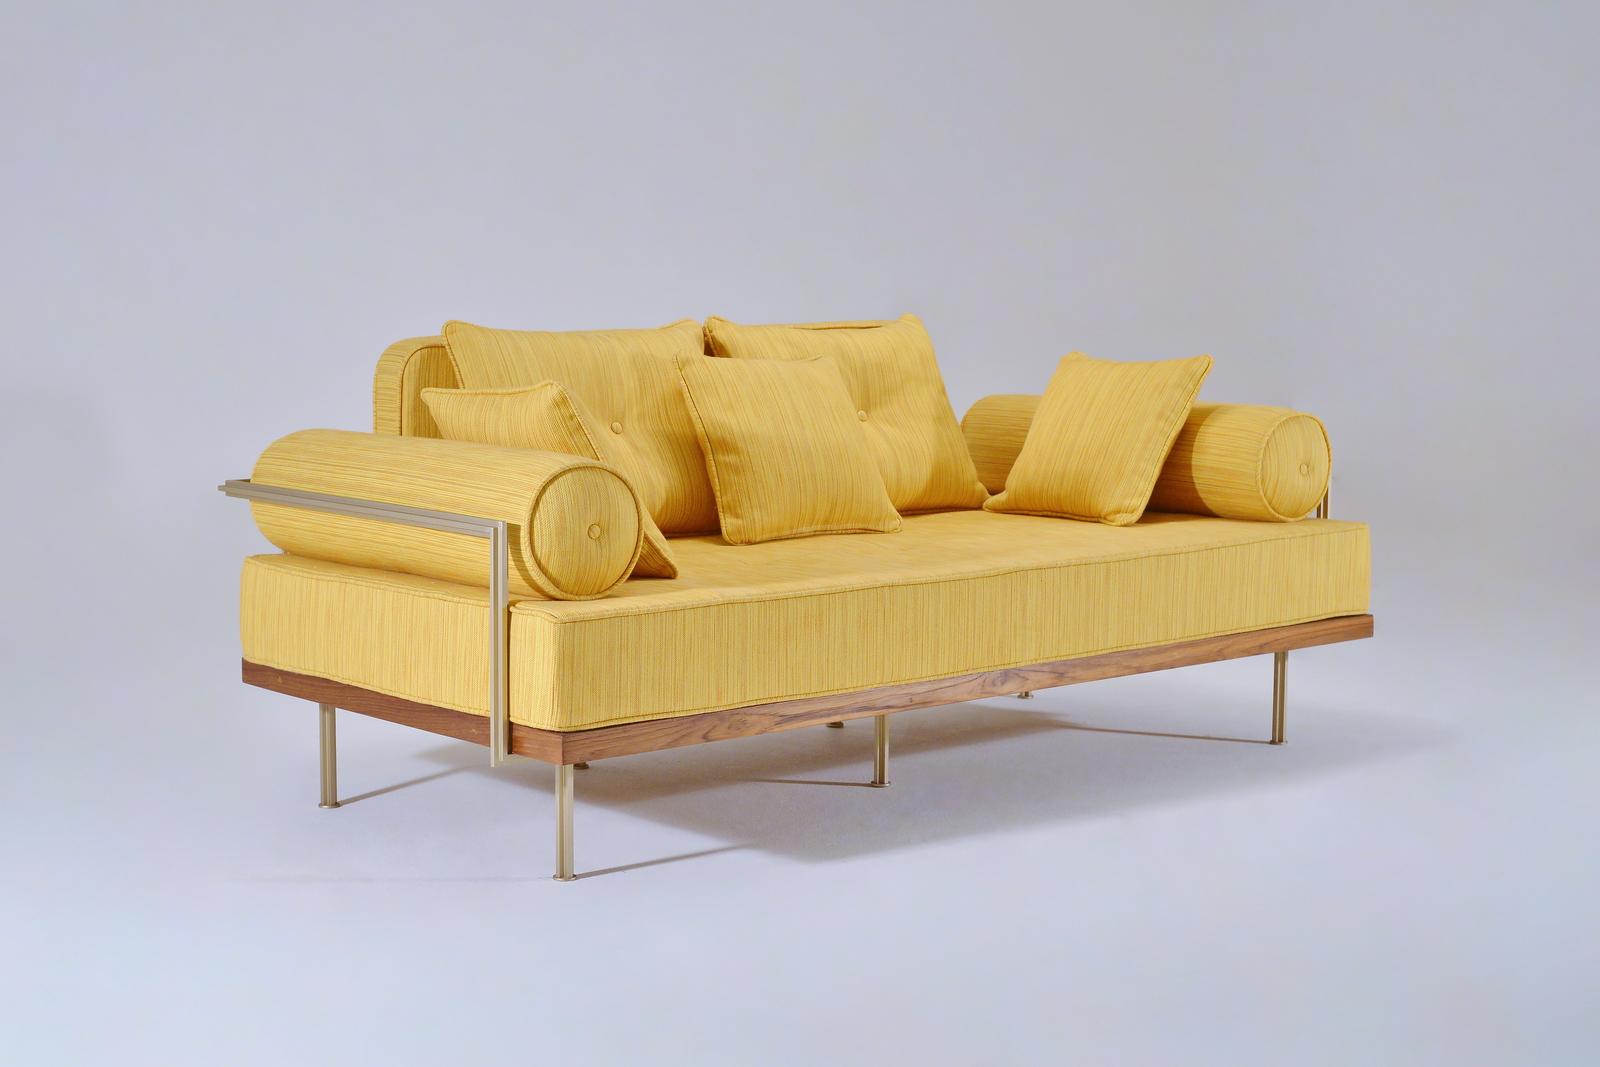 PTendercool-Sofa-PT71-BS1-TE-NO-Dido Yellow Agate-190228-03